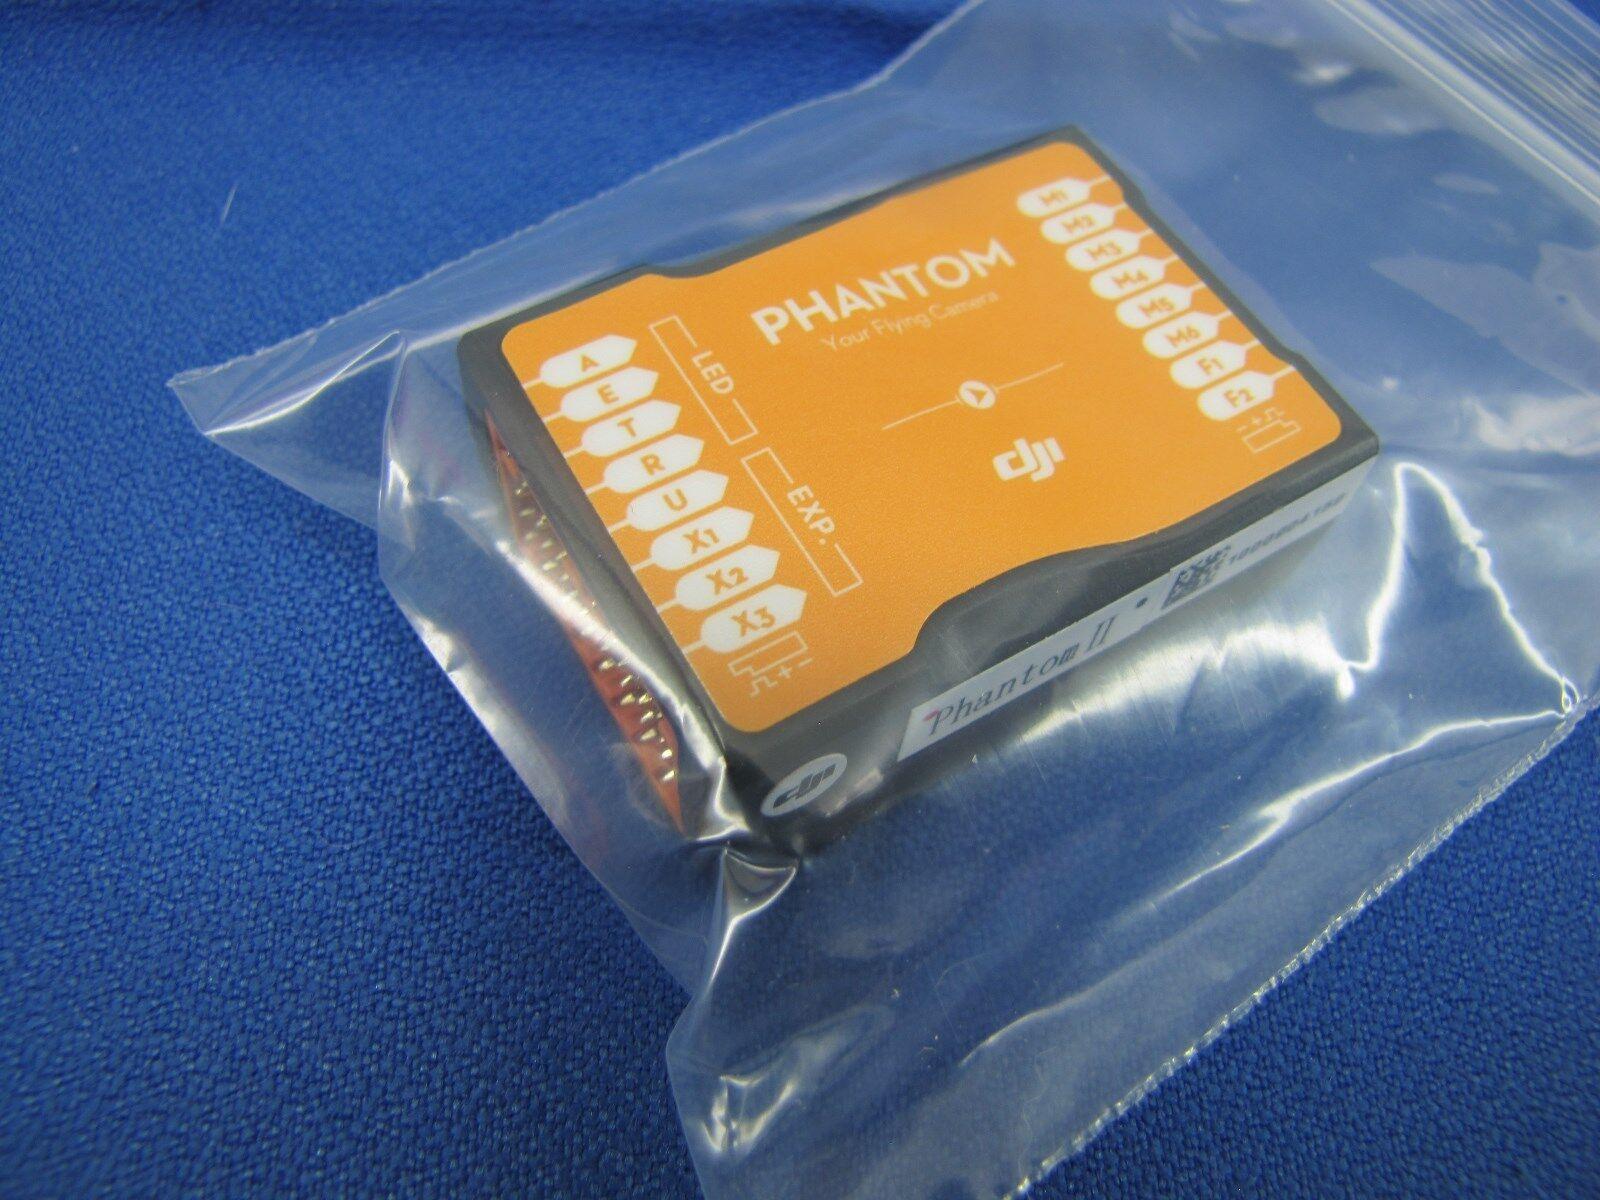 DJI Phantom 2 Main Flight Controller NAZA (Phantom 2 ONLY)  BuyNOW~GetFAST